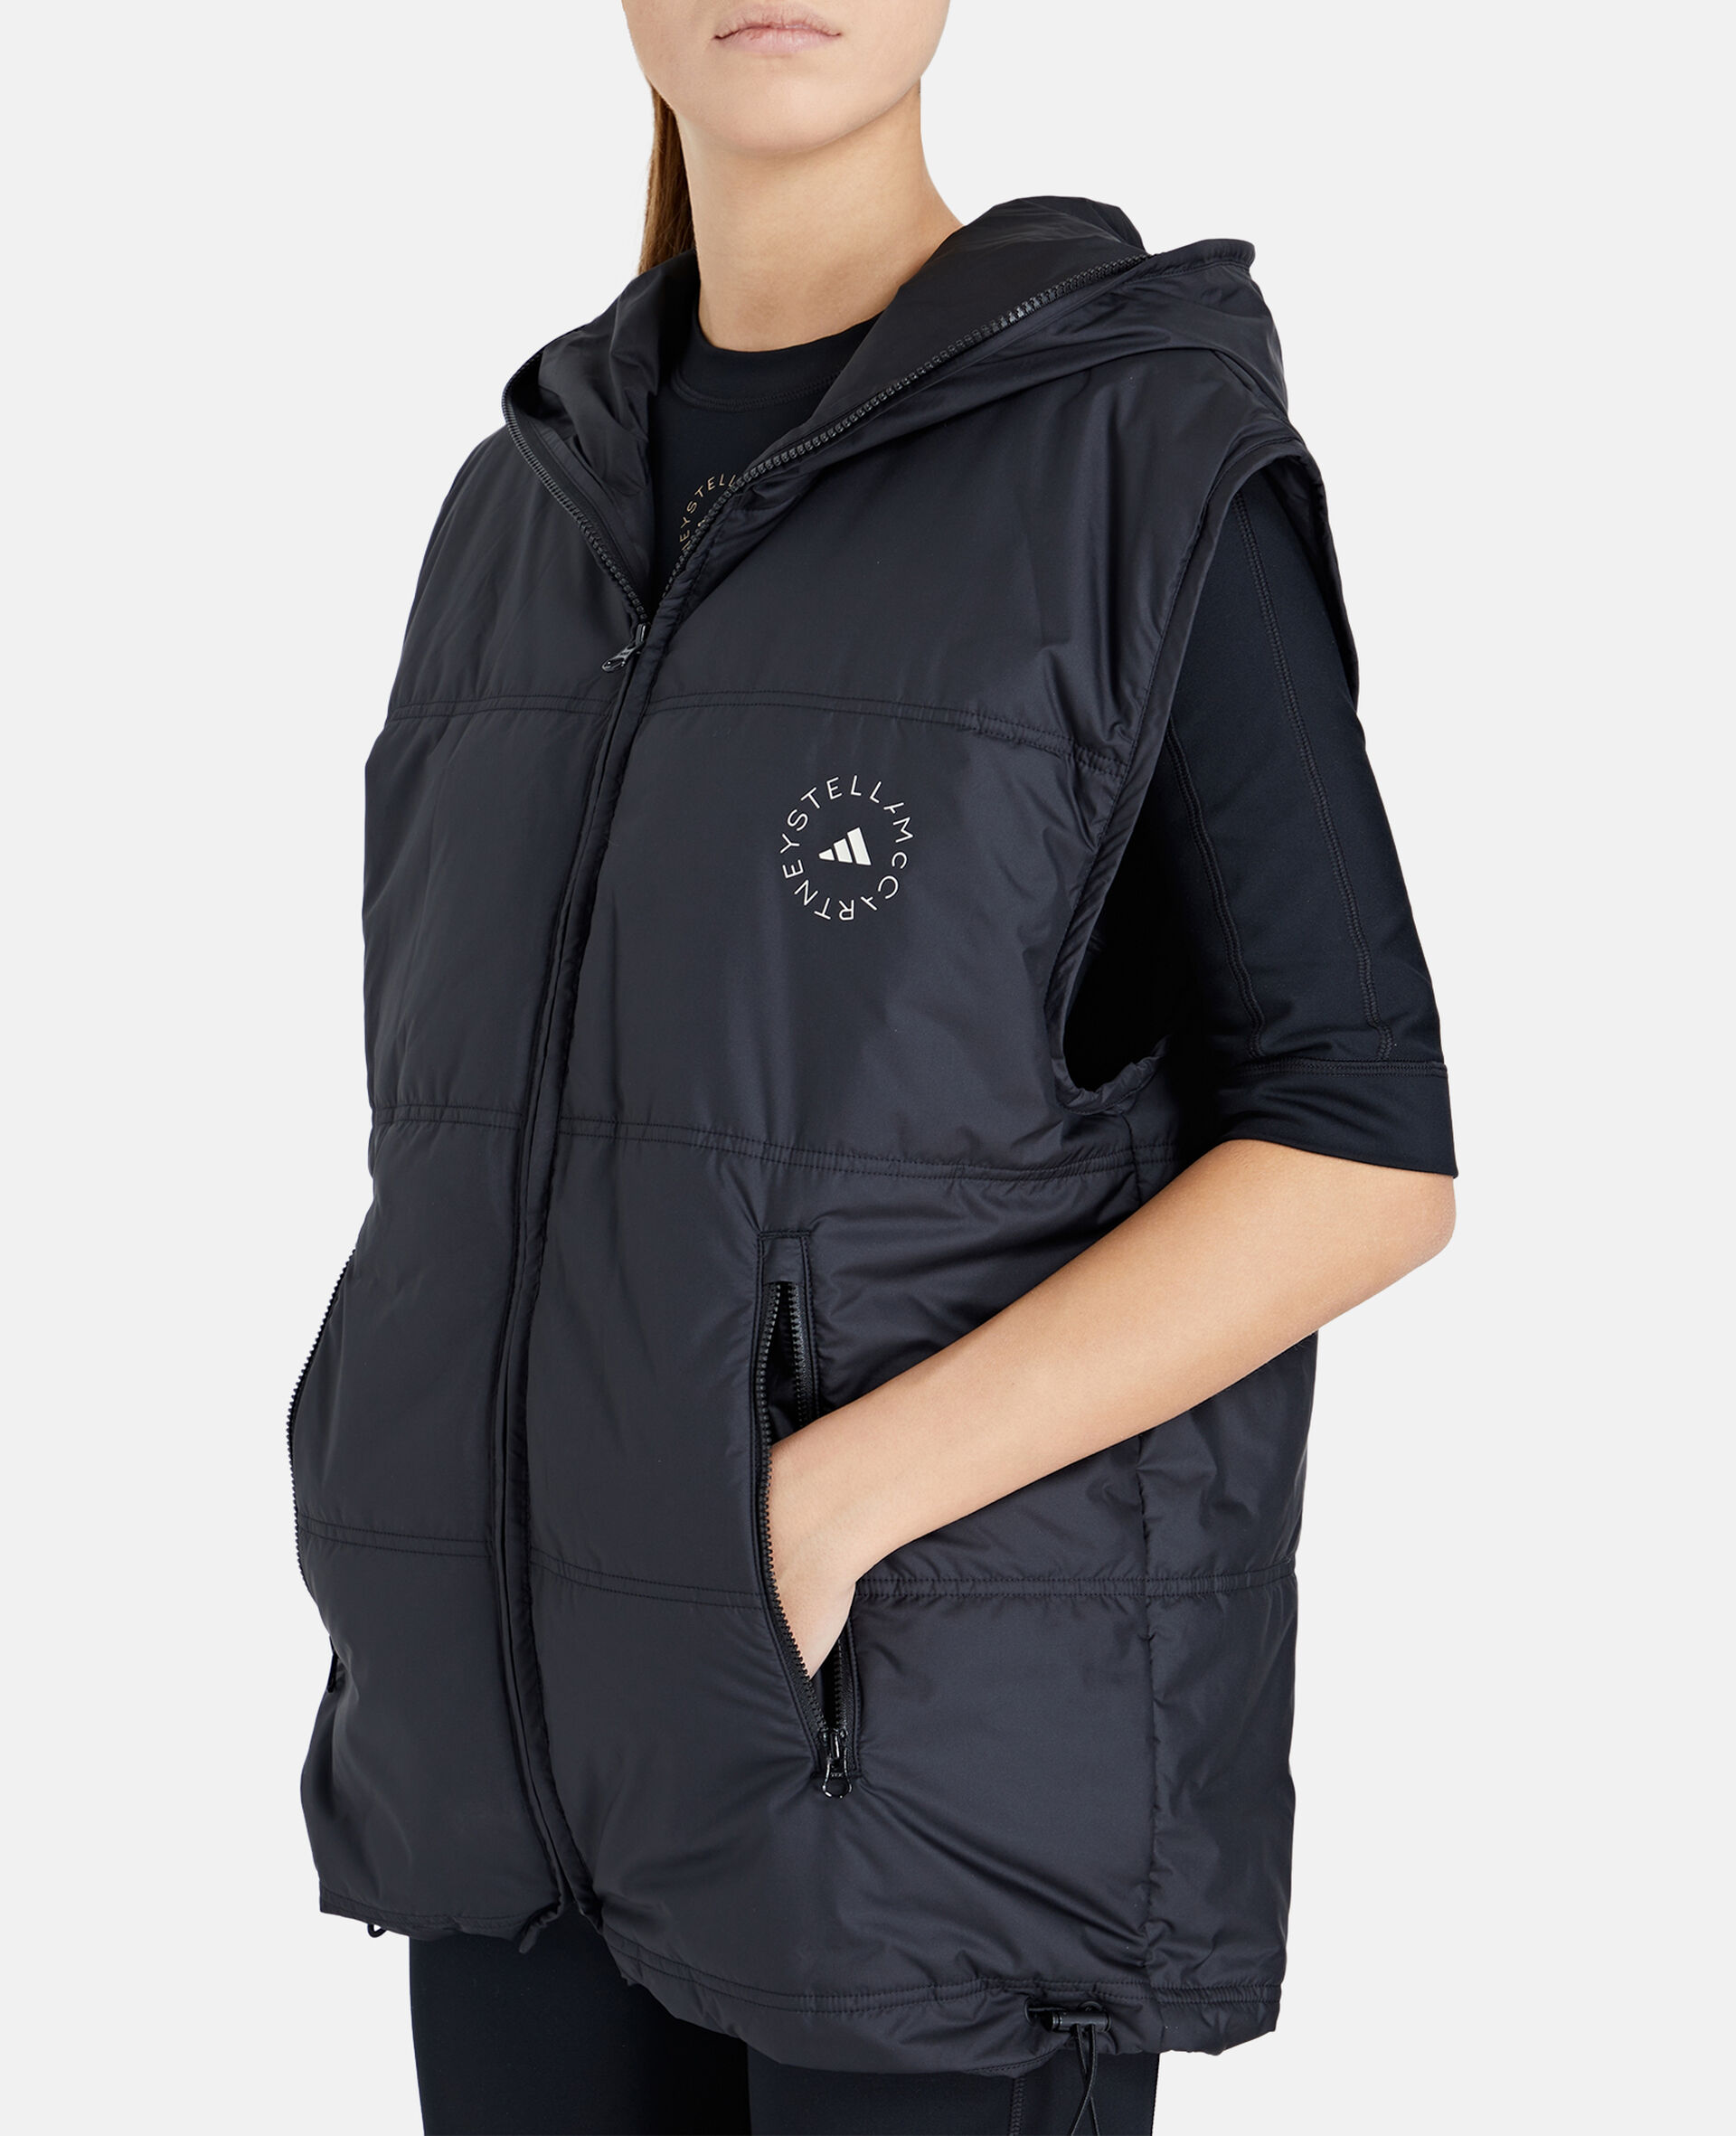 2-in-1 Mid-Length Padded Jacket-Black-large image number 3